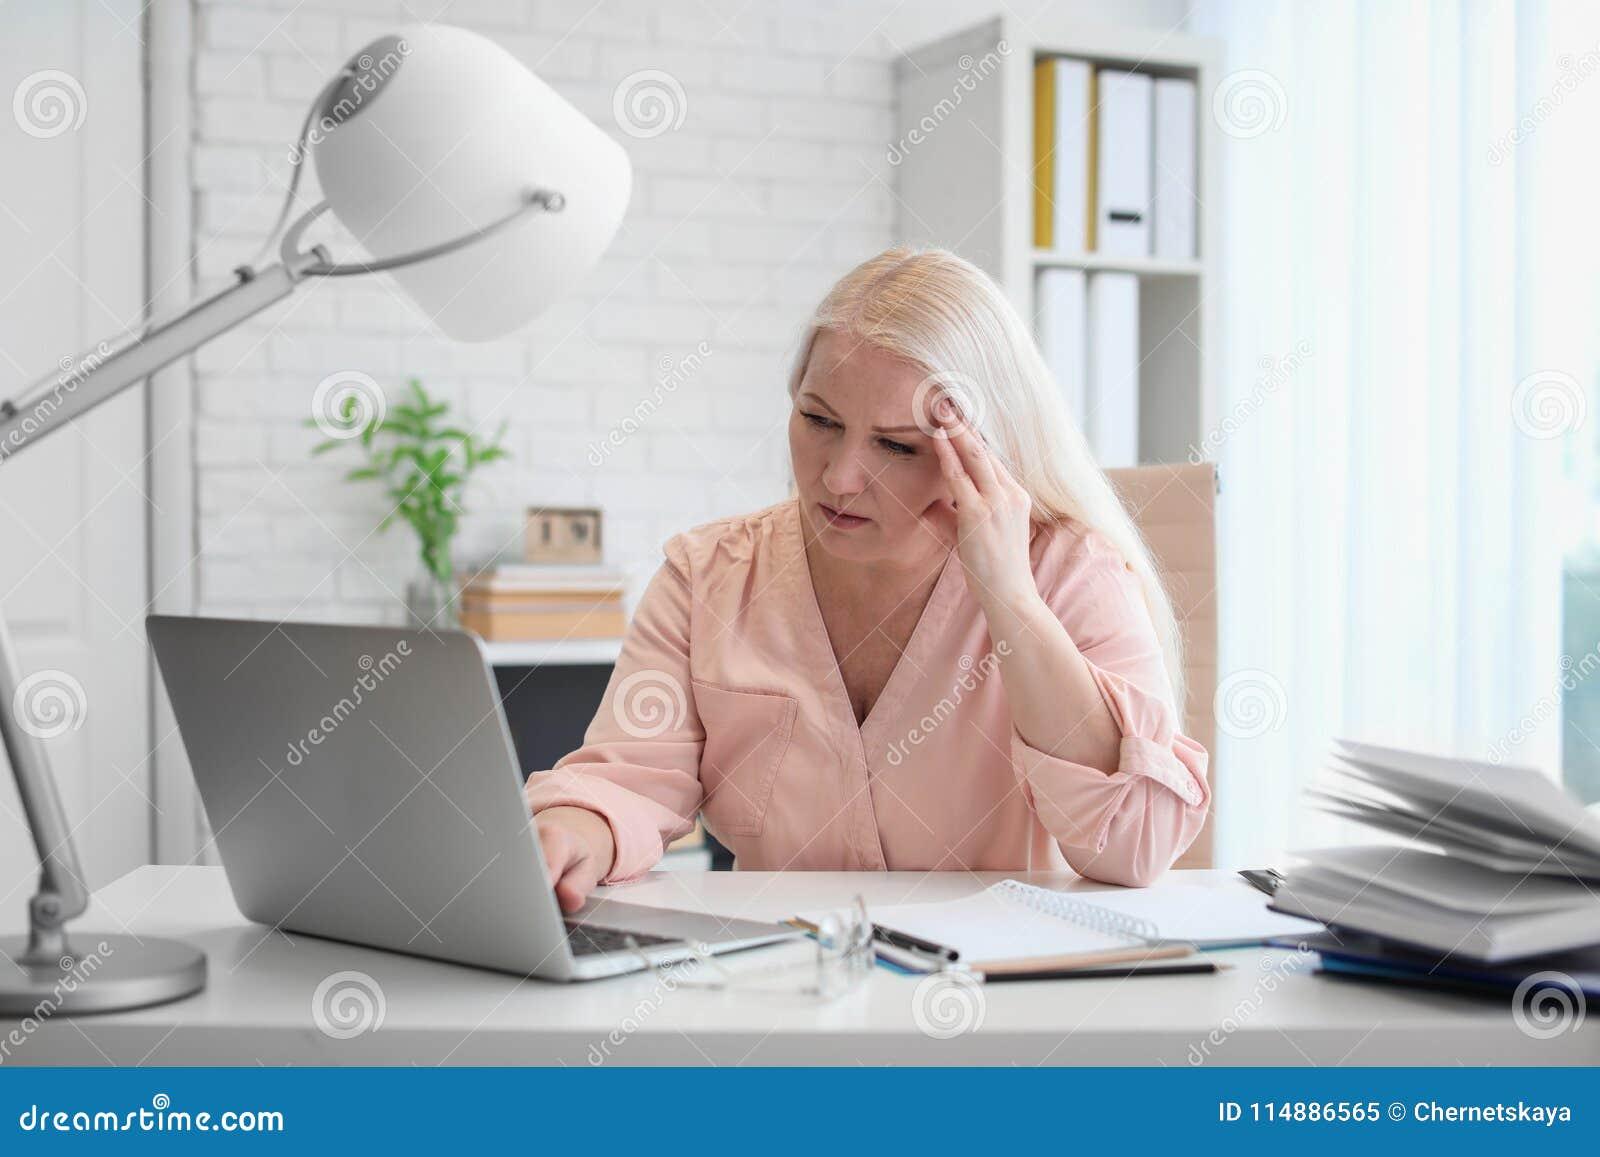 Mature women office secretary opinion you